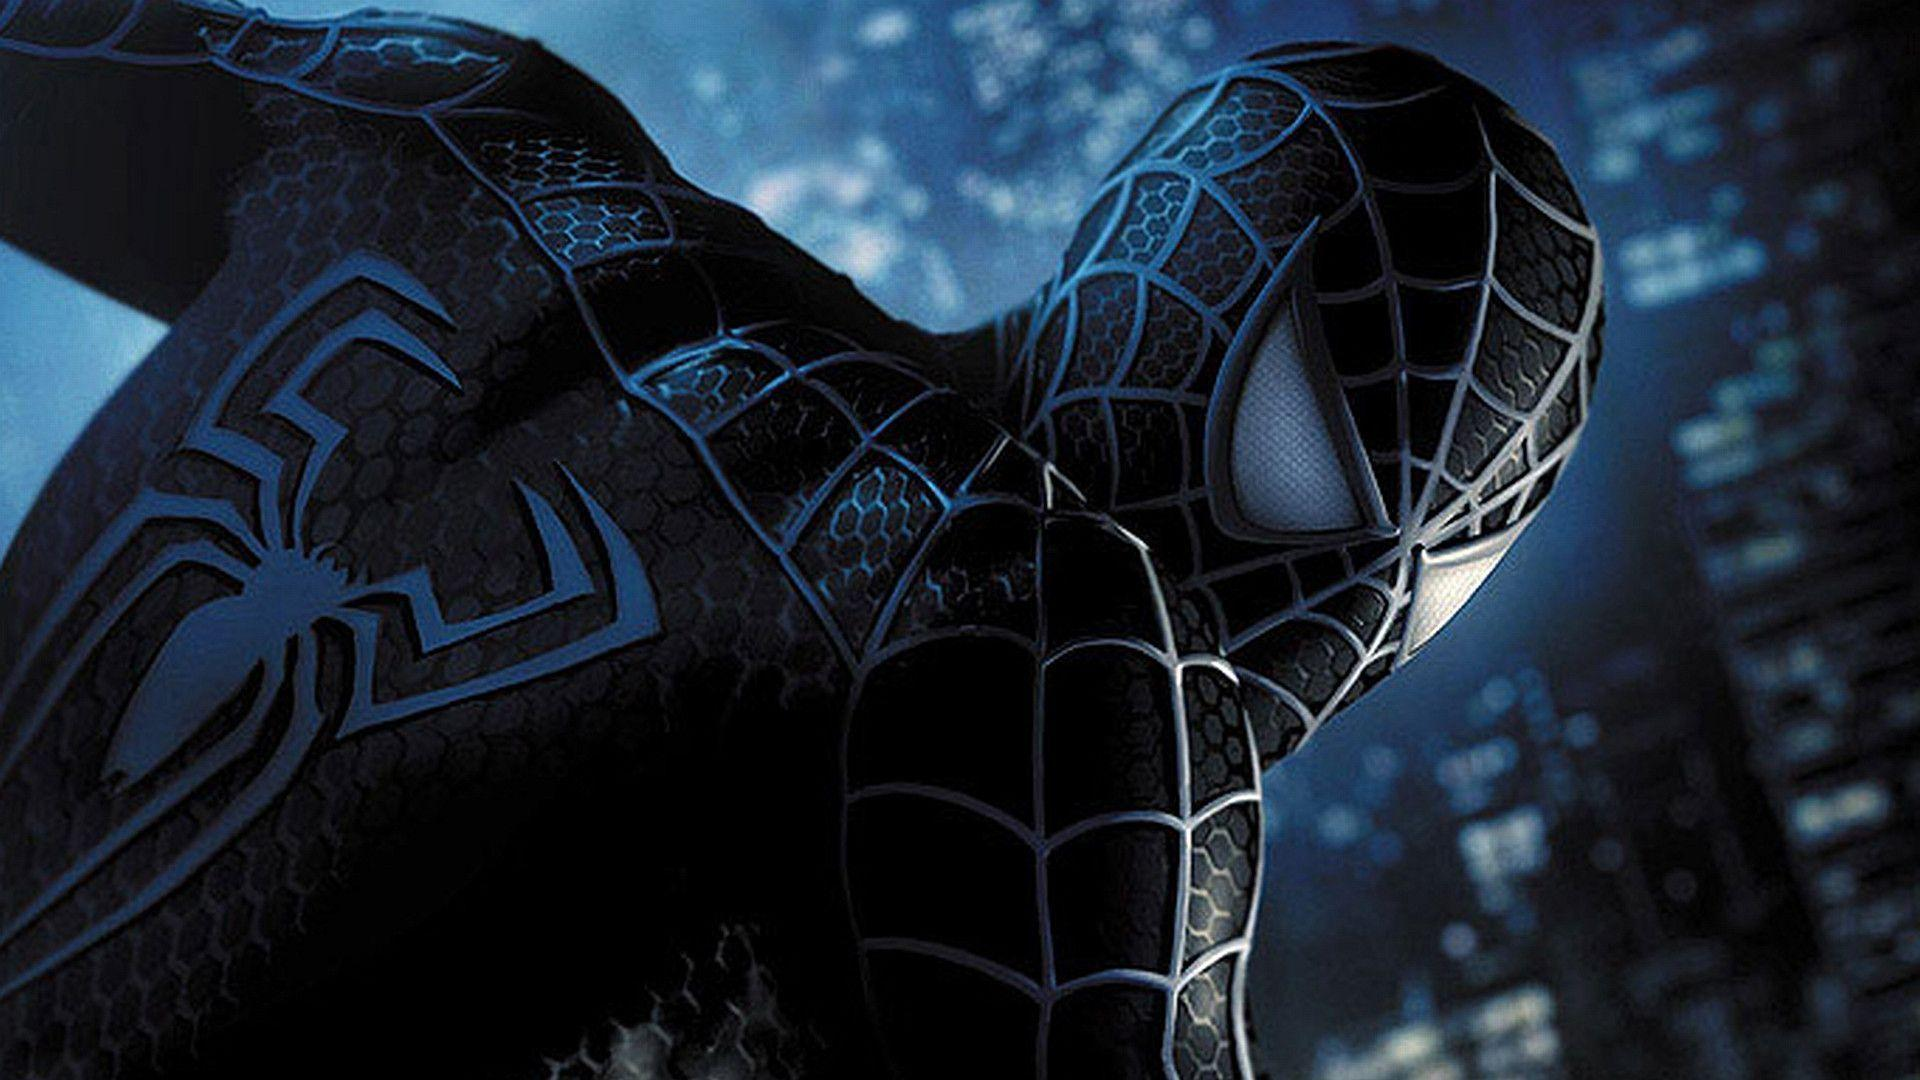 Spiderman 2015 Wallpapers Wallpaper Cave